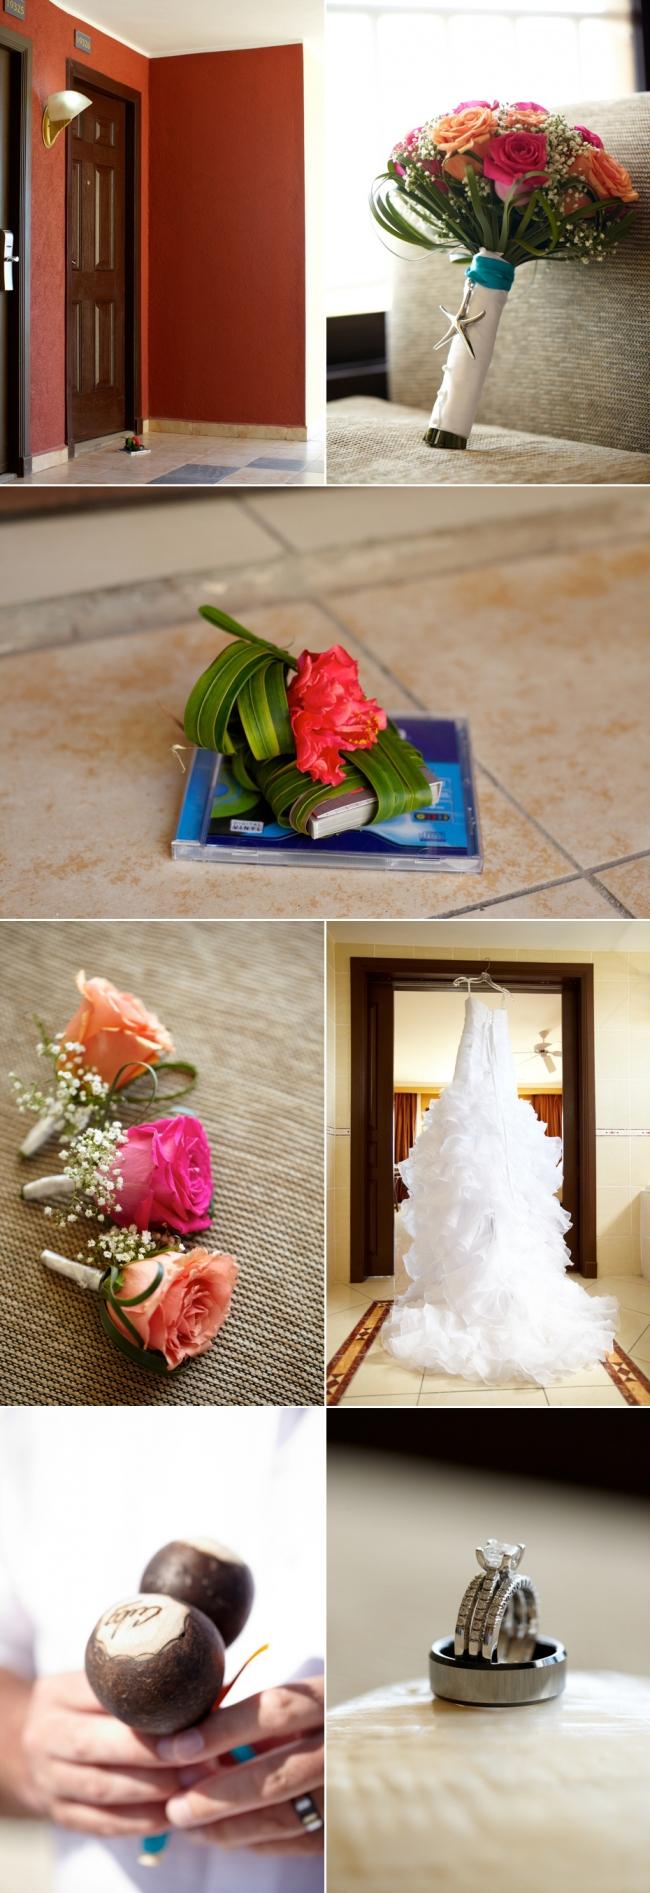 Destination Wedding_Destination Wedding Photos_Destination Wedding Photographer_ Destination Wedding Photography_ Cuba Wedding _ Cuba Wedding Photos_001